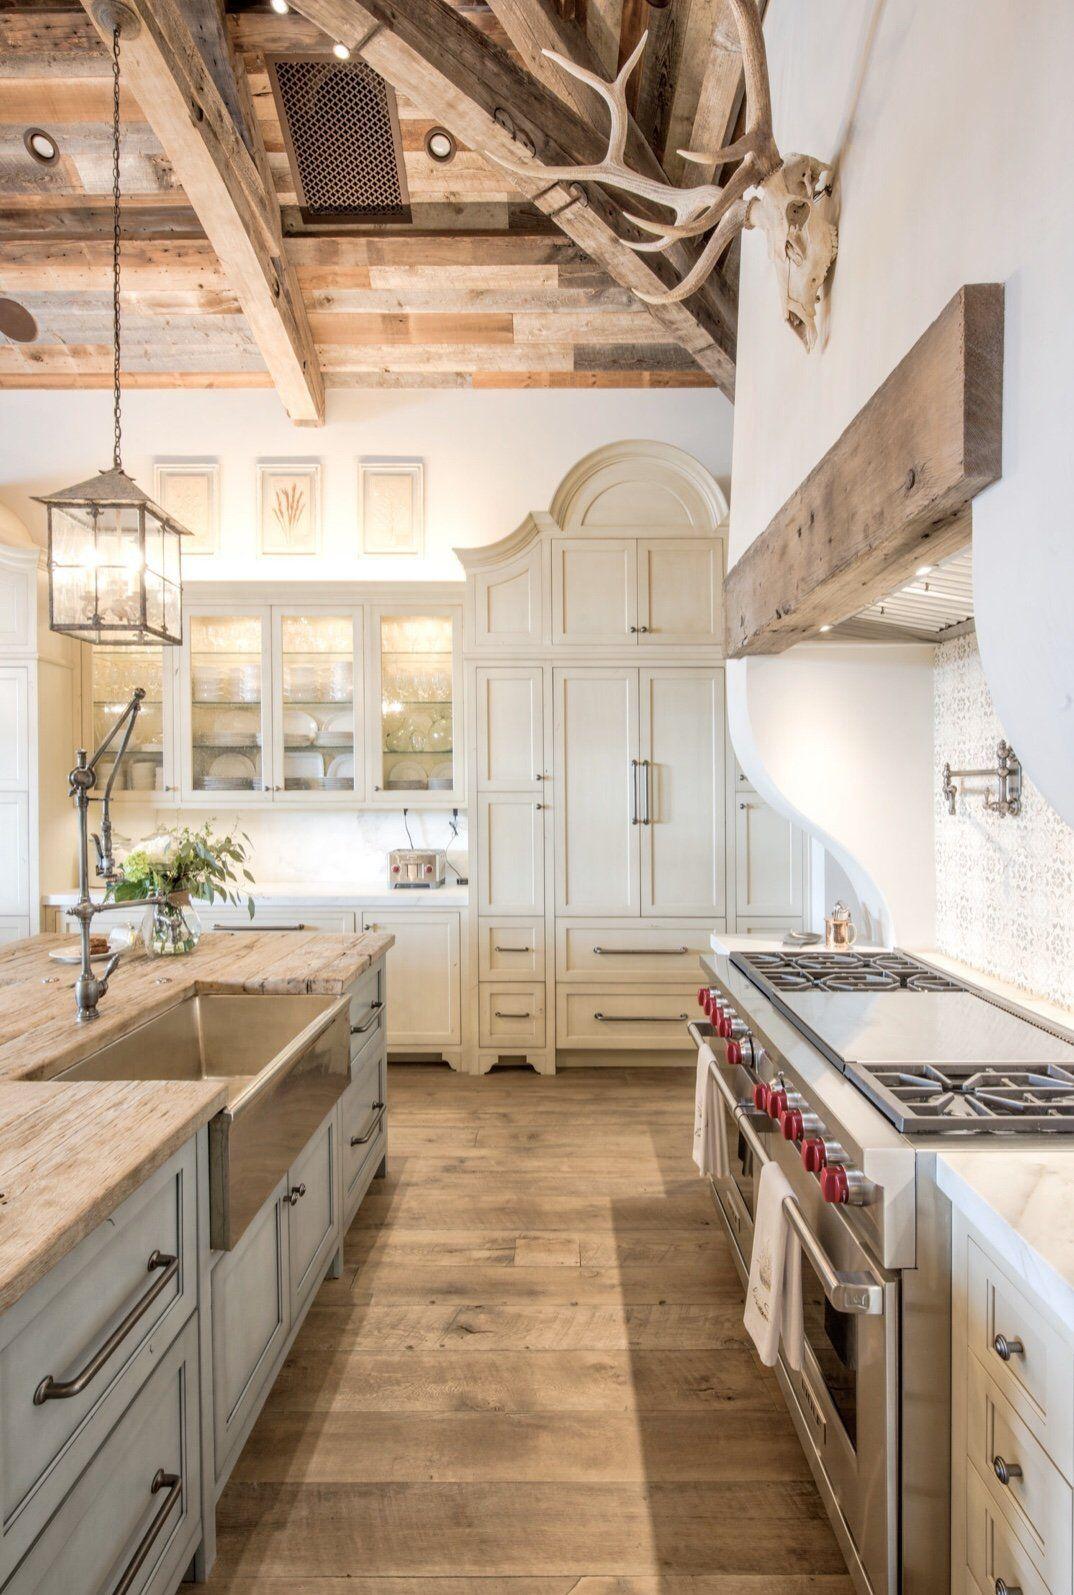 european farmhouse jettset farmhouse kitchen design kitchen inspirations on kitchen ideas european id=17173